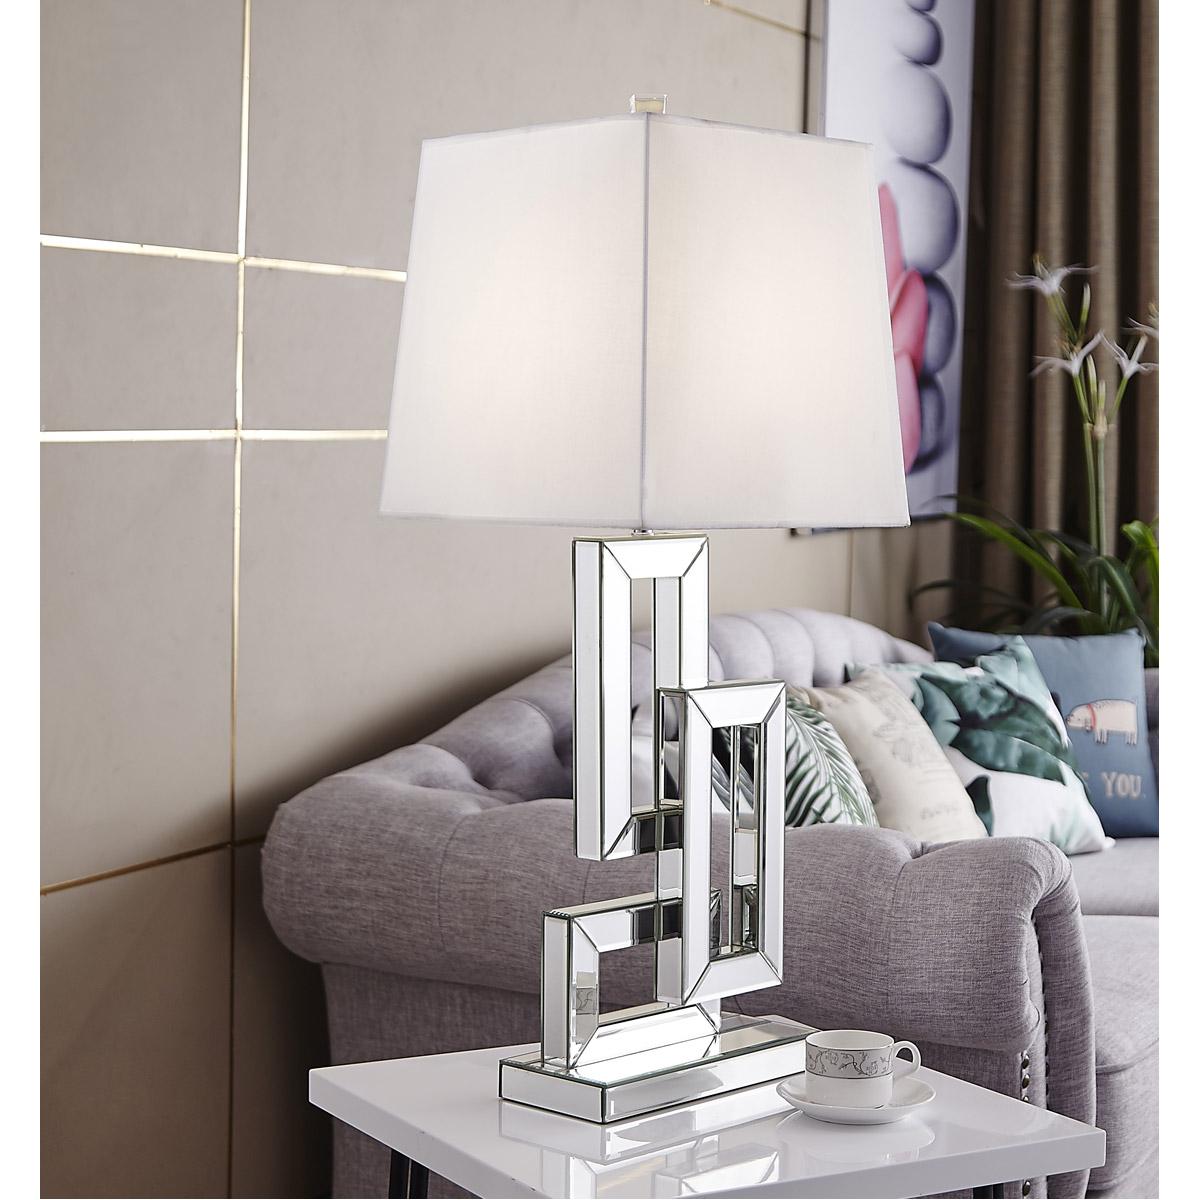 Table Lamp White Shade Mirrored Modern Living Room Bedroom Hallway